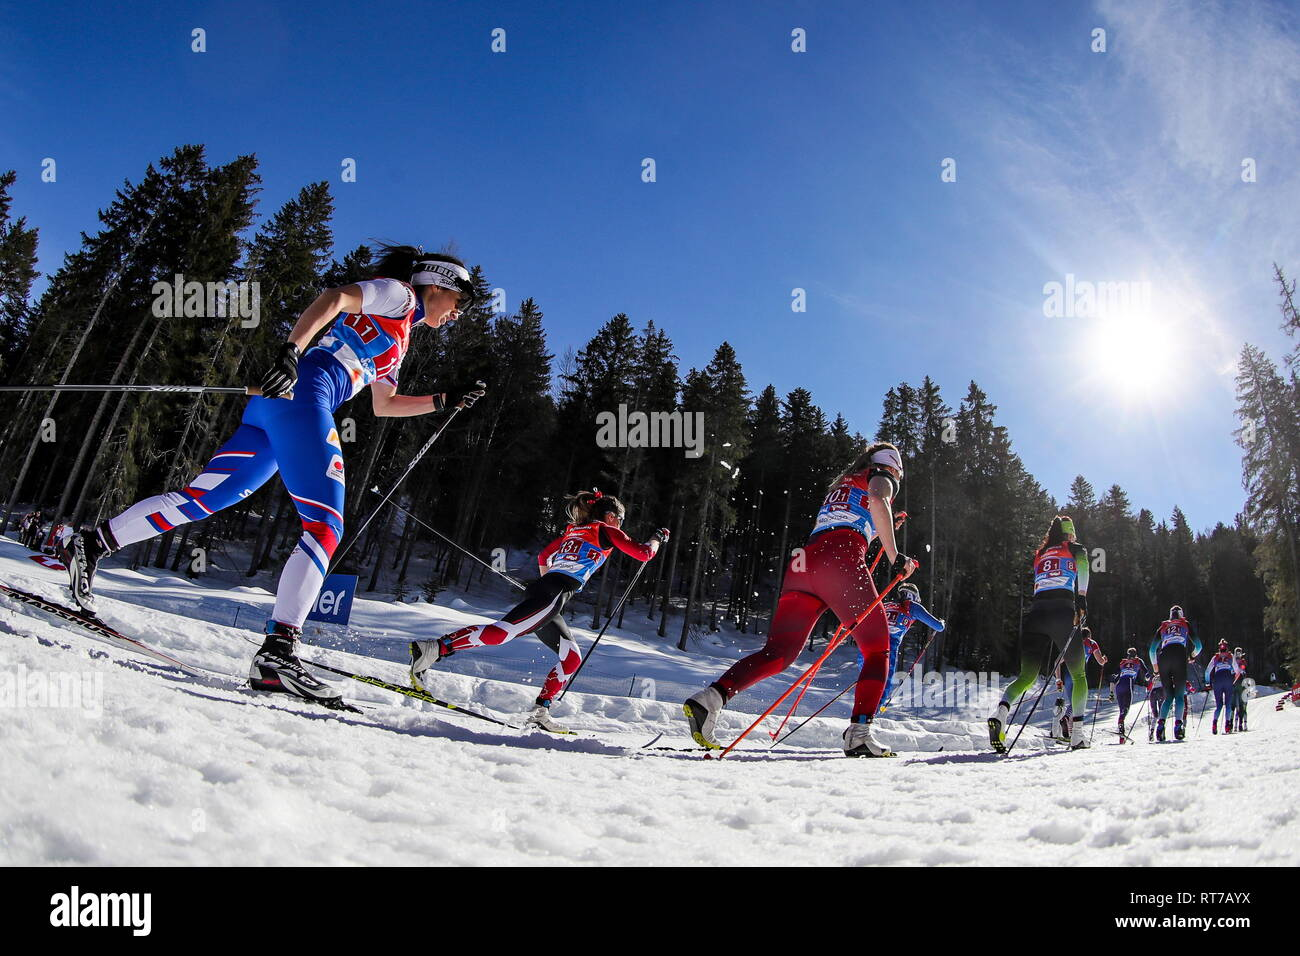 Tirol, Austria  28th Feb, 2019  TIROL, AUSTRIA - FEBRUARY 28, 2019